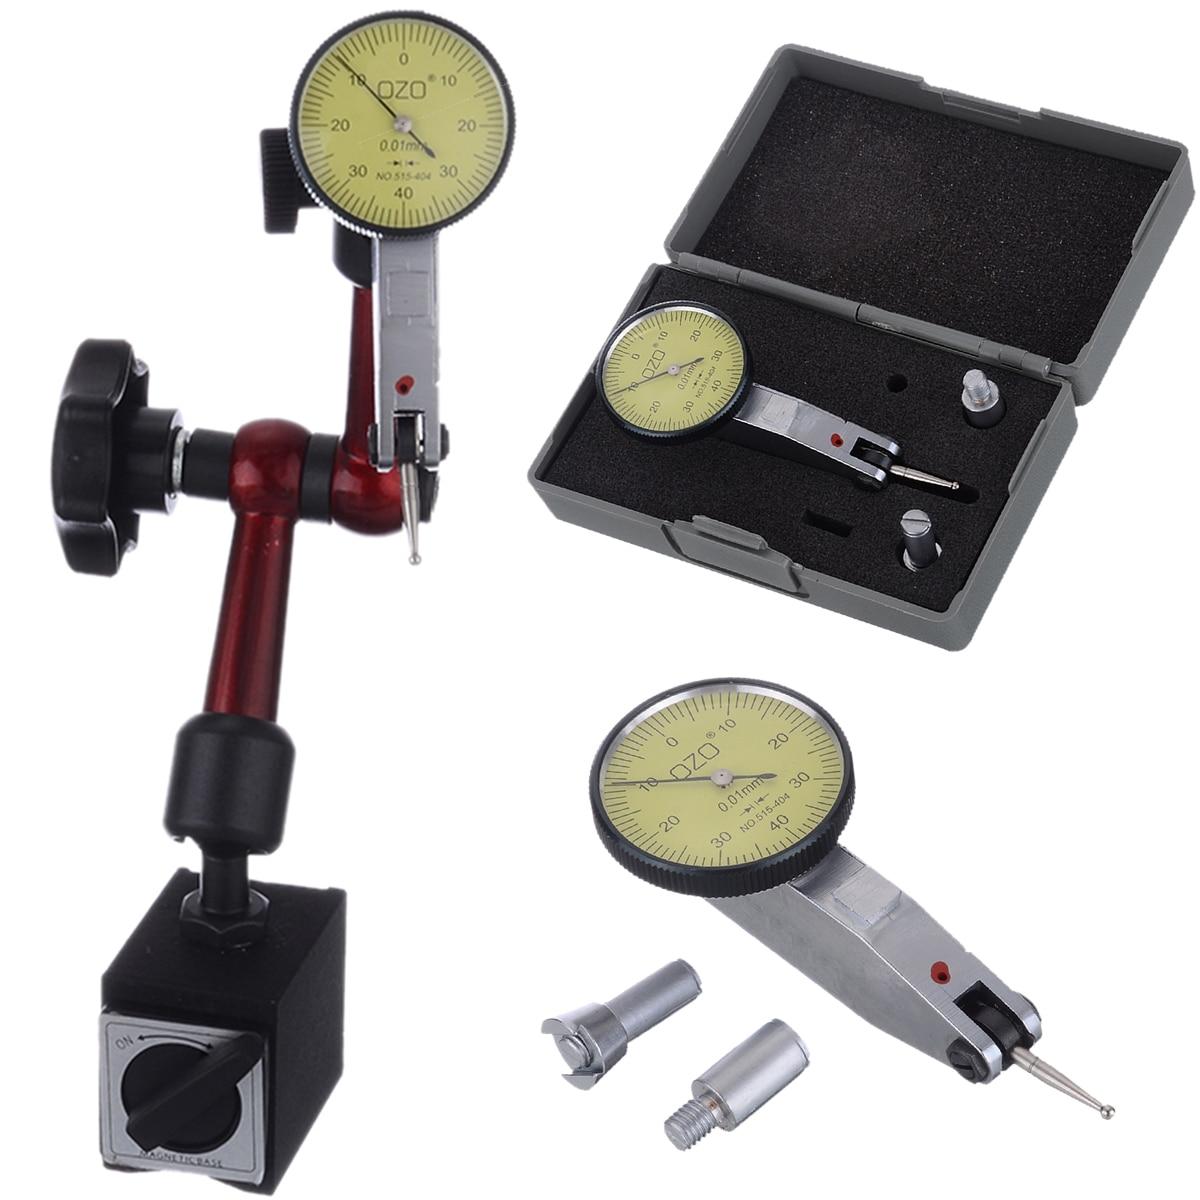 1Pcs Flexible Magnetic Base Holder + Dial Test Indicator Gauge Scale Precision 0-0.8mm Gauge Stand Indicator Tool For Measuring